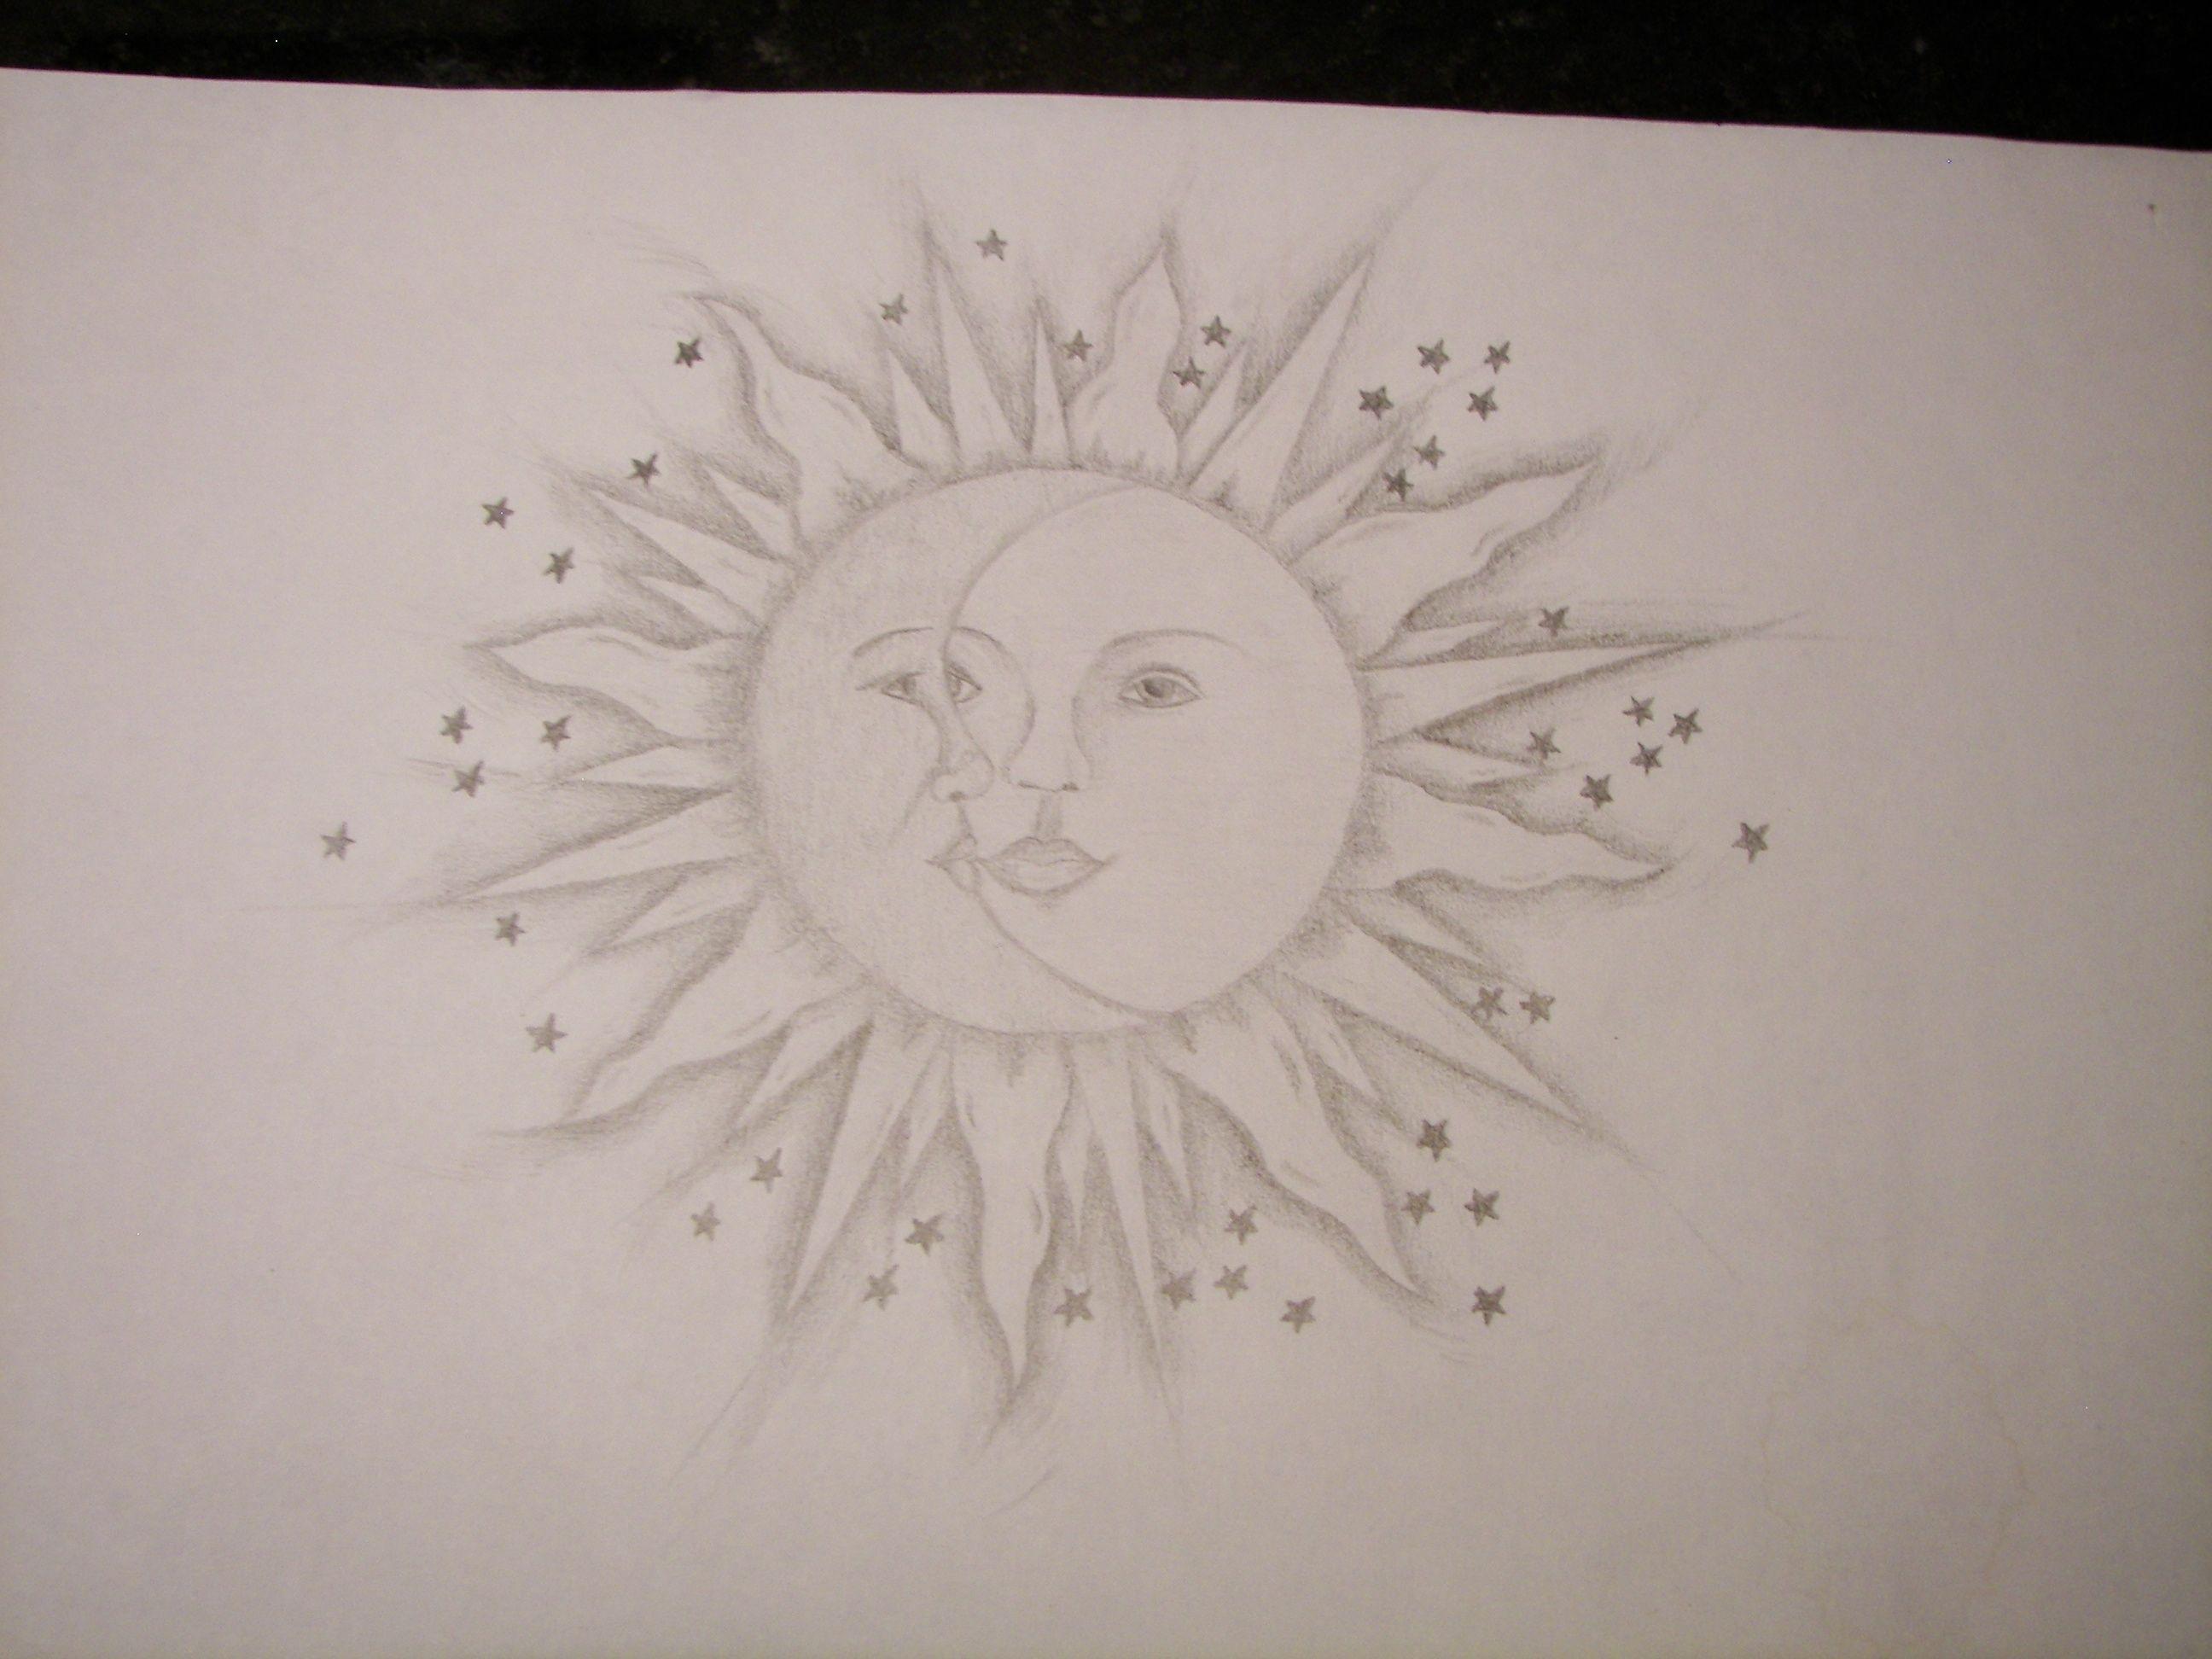 S - SUN & MOON DRAWING (pencil) | Tattoos | Pinterest ...